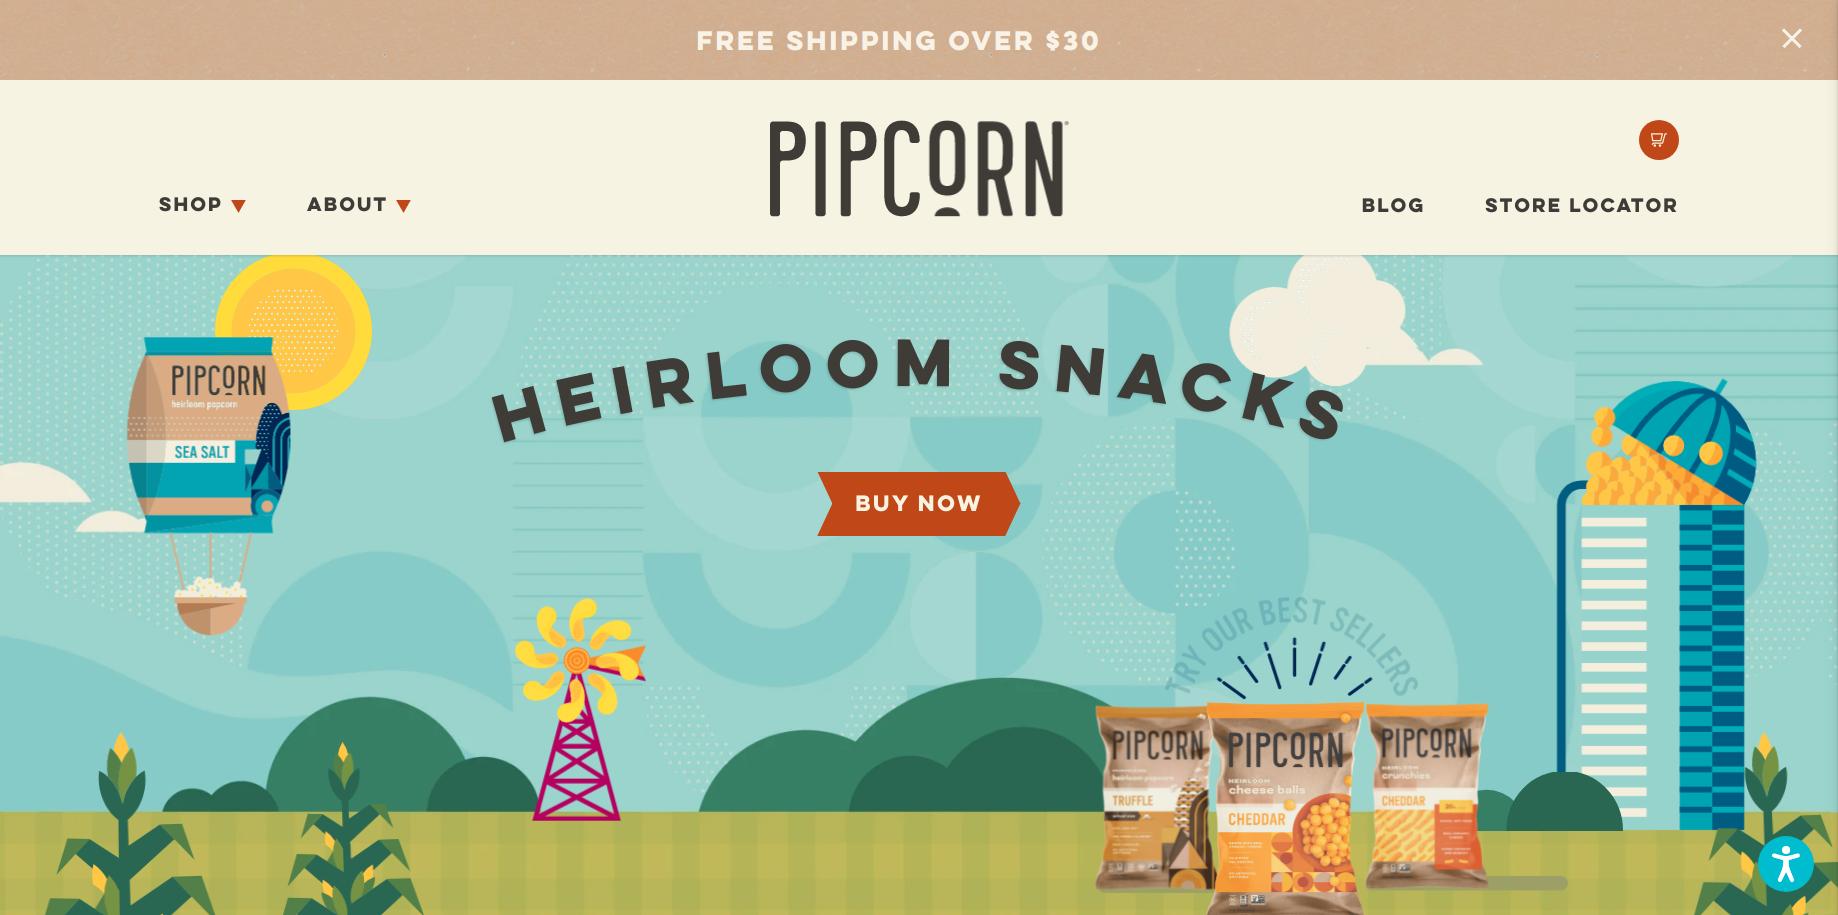 pipcorn-store